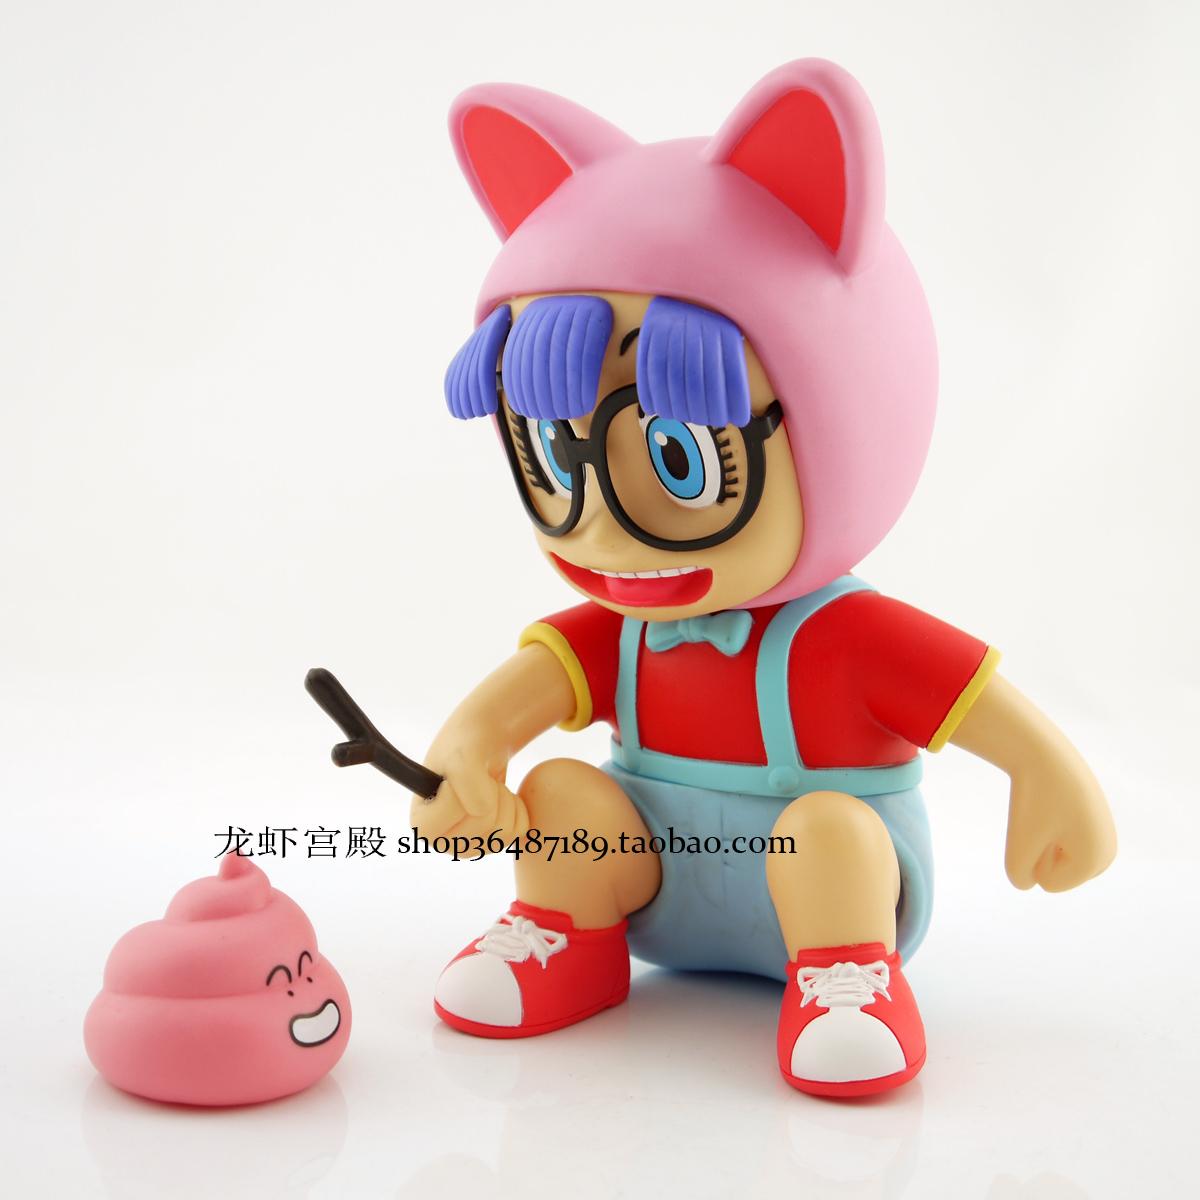 iq博士模型 阿拉蕾公仔 小云 玩便便 动漫创意玩具手办 生日礼品商品